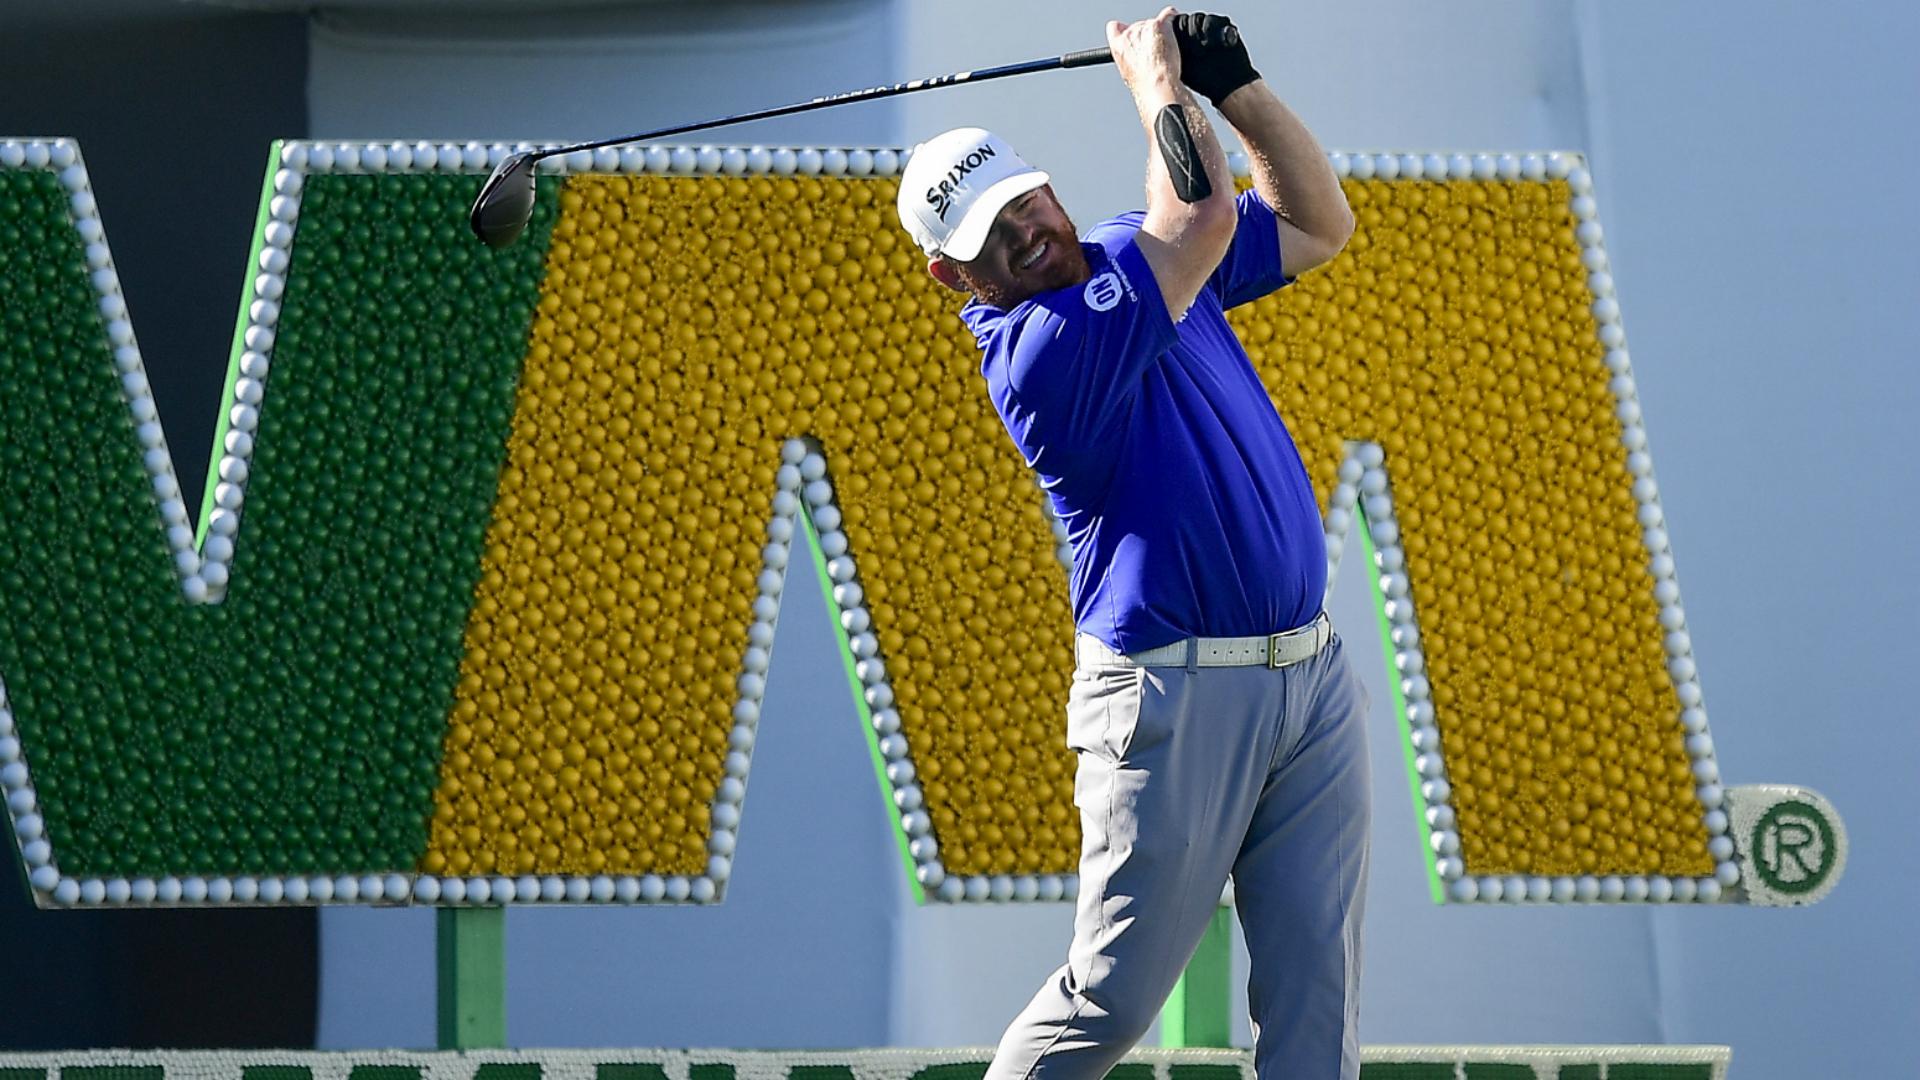 Holmes leapfrogs Clark at Phoenix Open, struggling Spieth misses cut